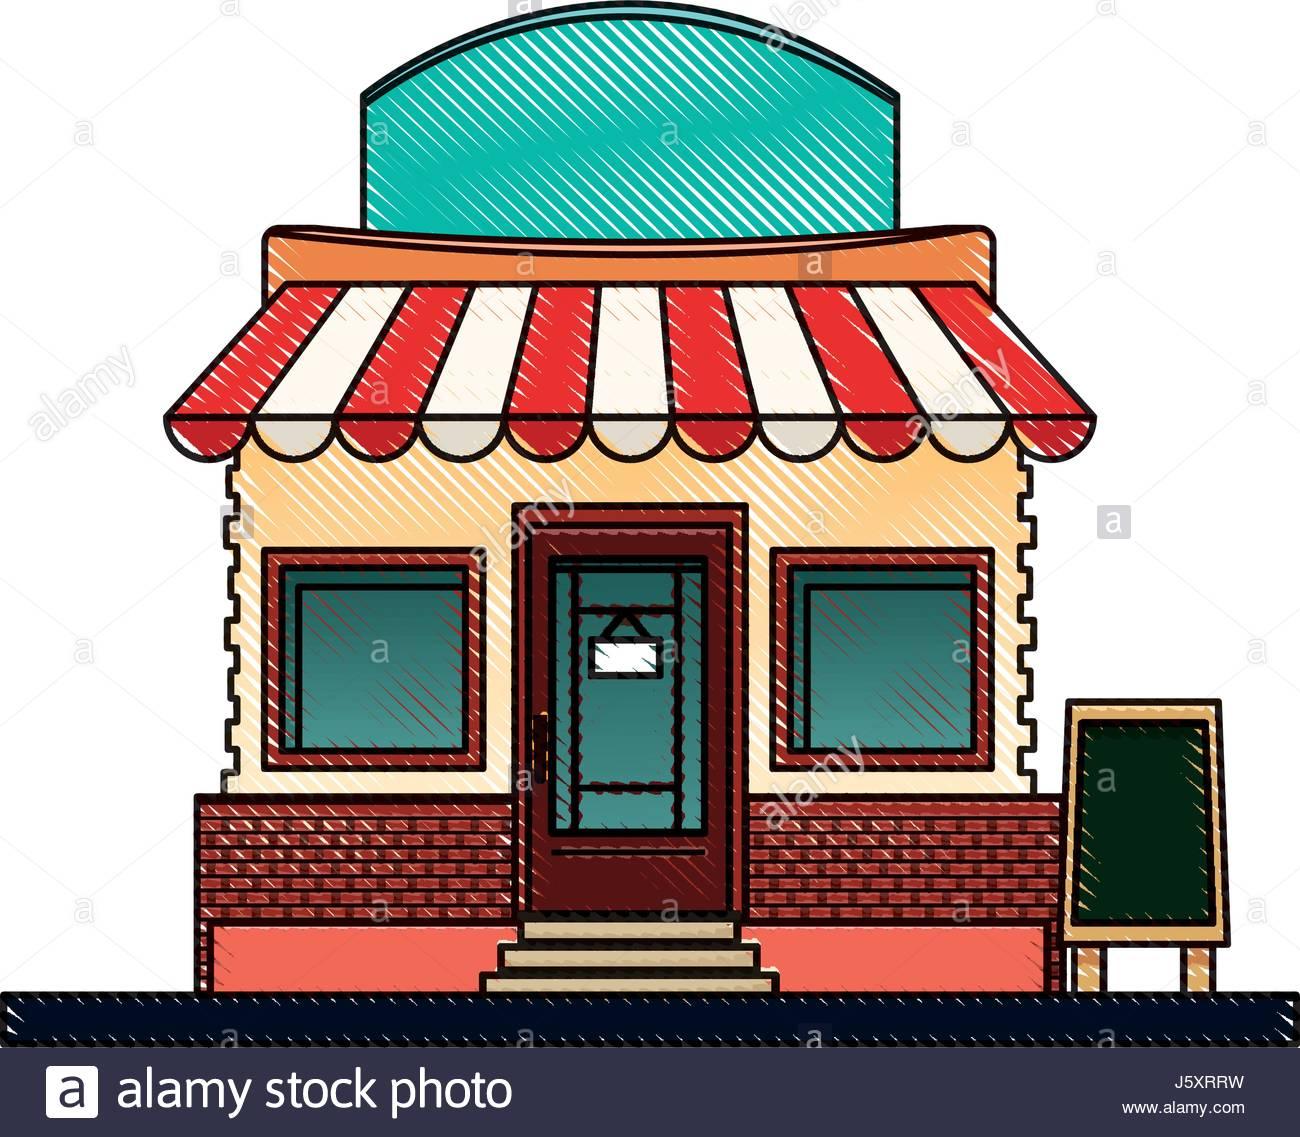 1300x1137 Drawing Store Market Business Shop Building Stock Vector Art